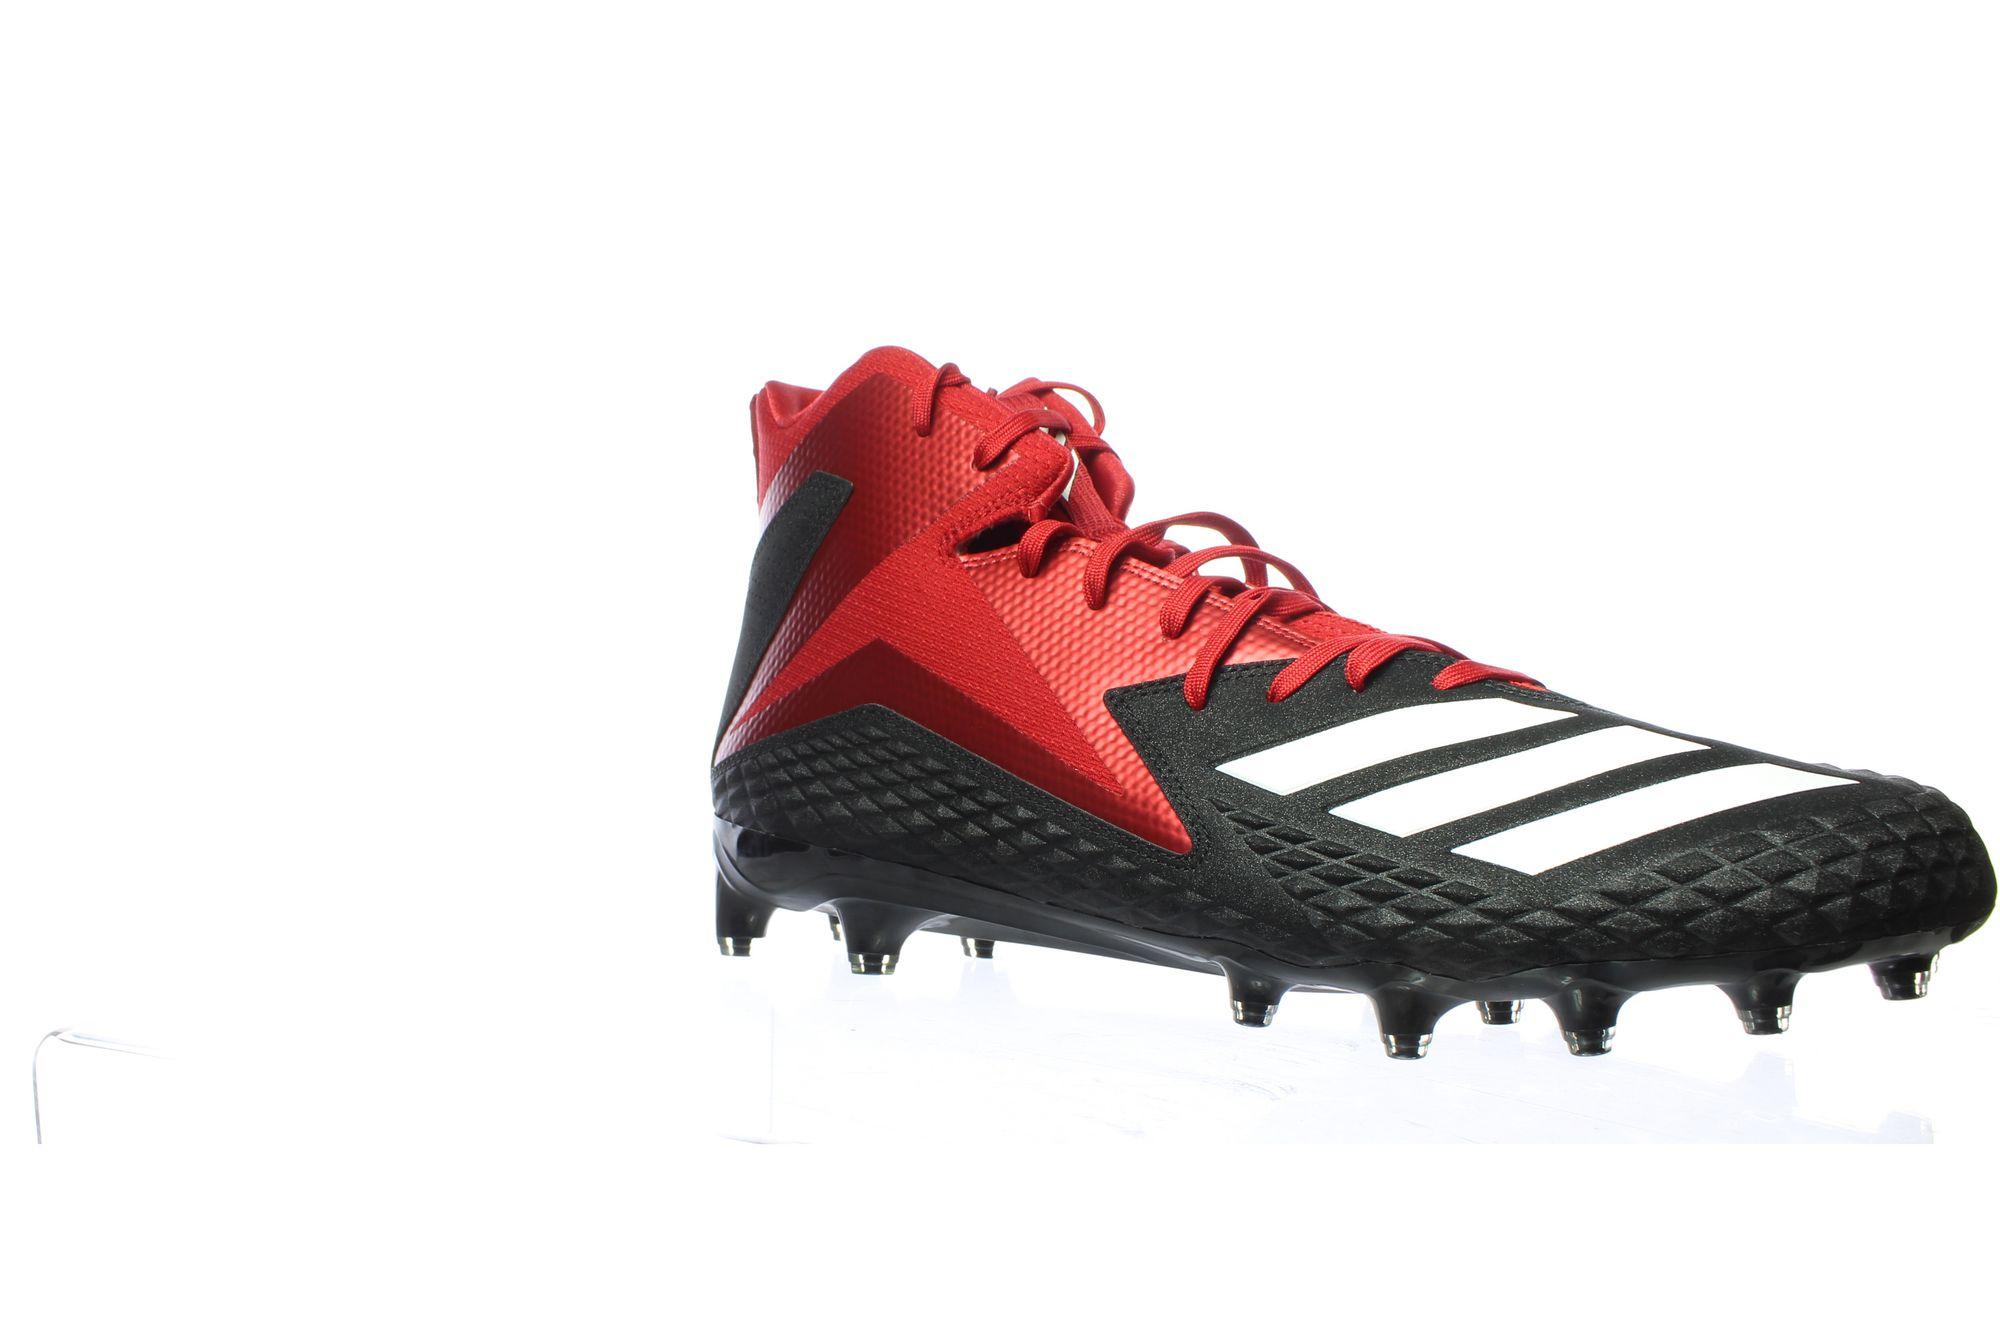 JG 738871  01 - Adidas Mens Freak X Black/White/Power Red Football Cleats Size 15 (738871)